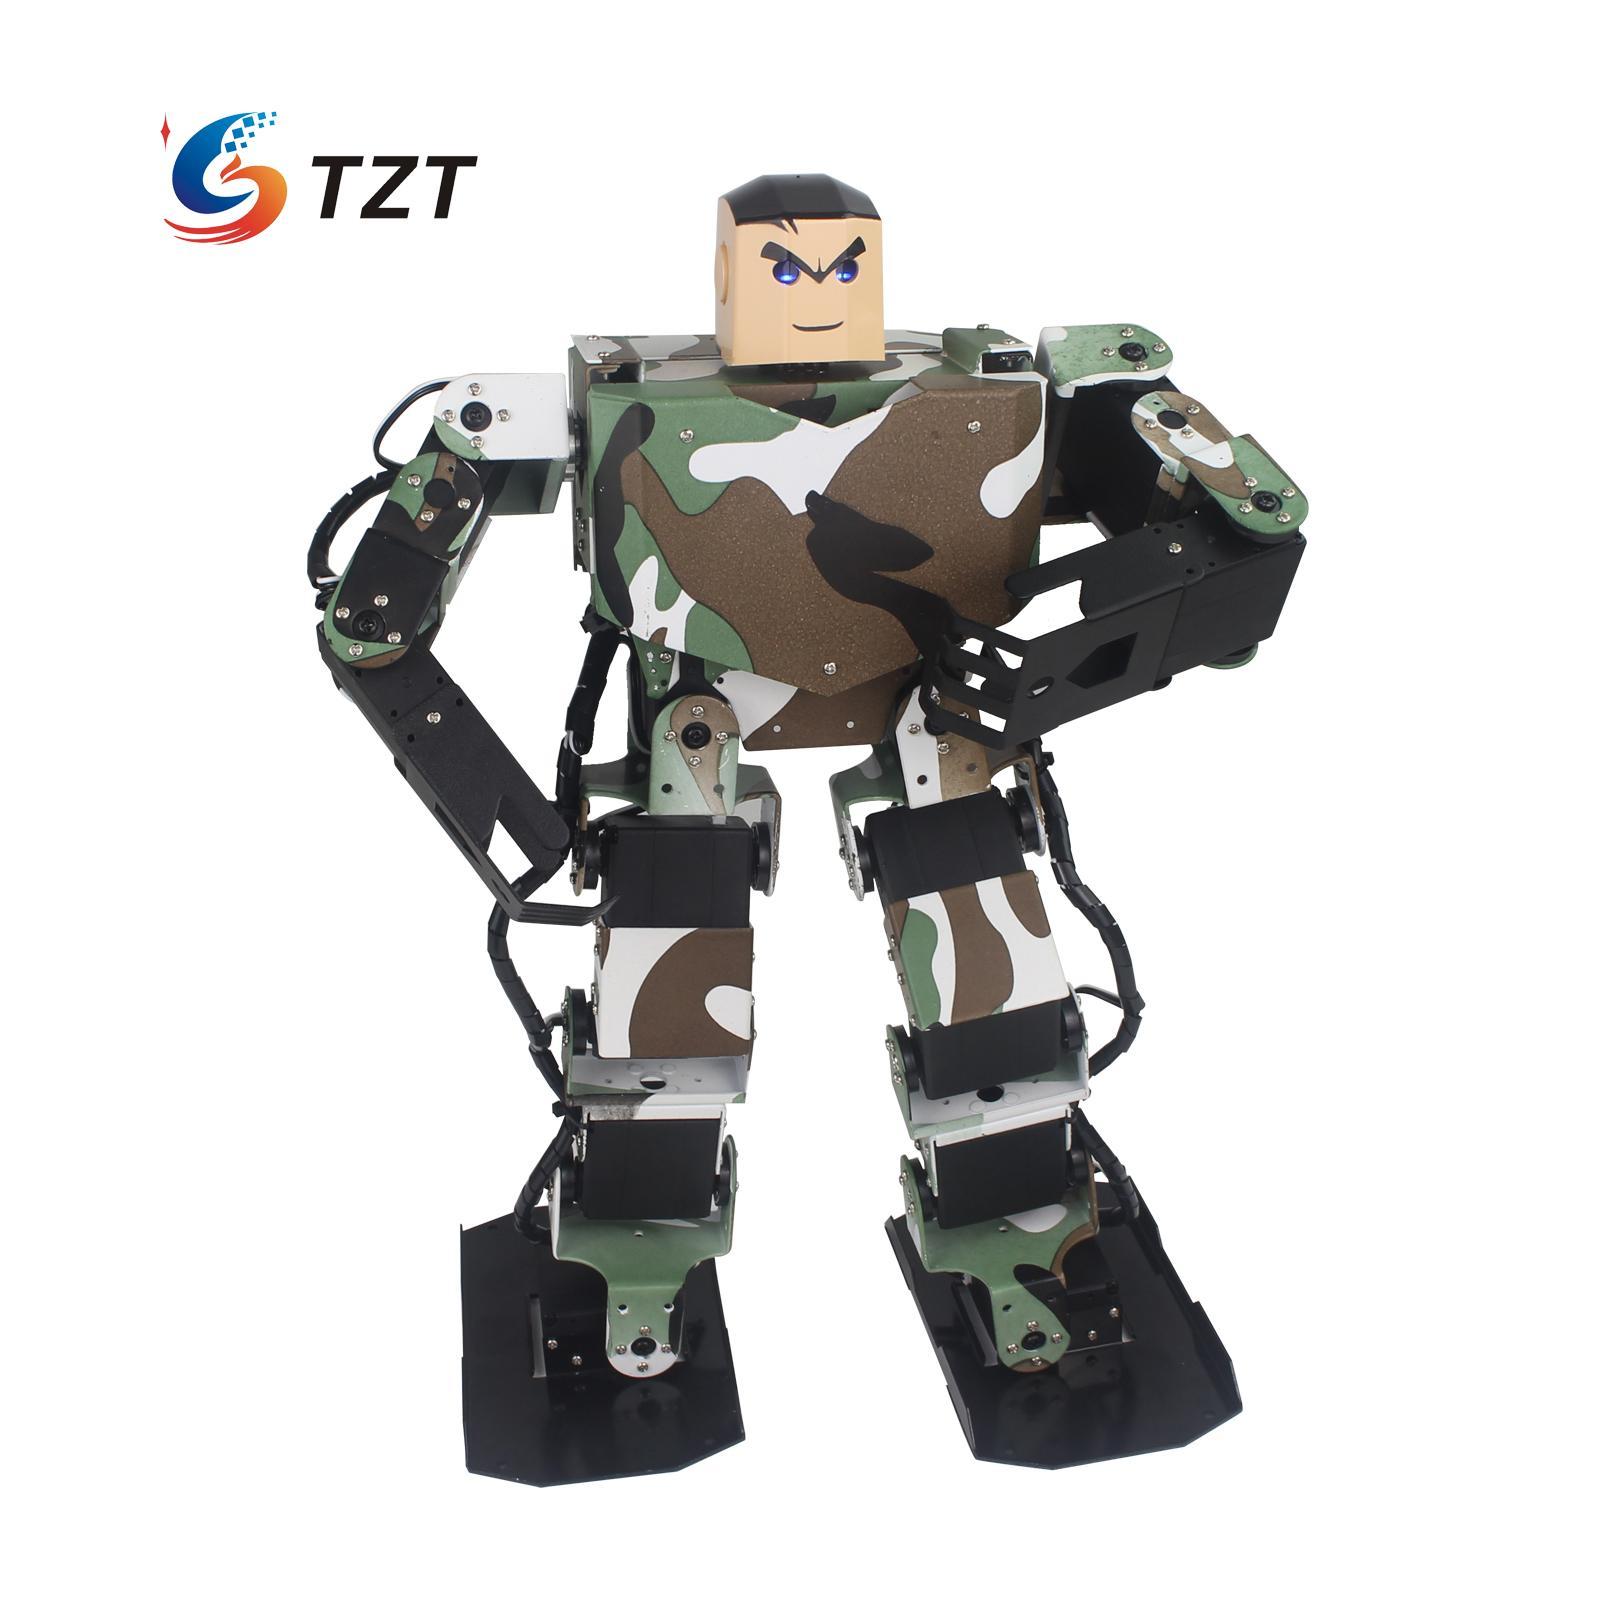 Soldier King 16DOF Smart Humanoid Robot Contest Dance Programmable Biped Robotics with Servos/Handle/Controller Assembled soldier king 16dof smart humanoid robot frame contest dance biped robotics for diy